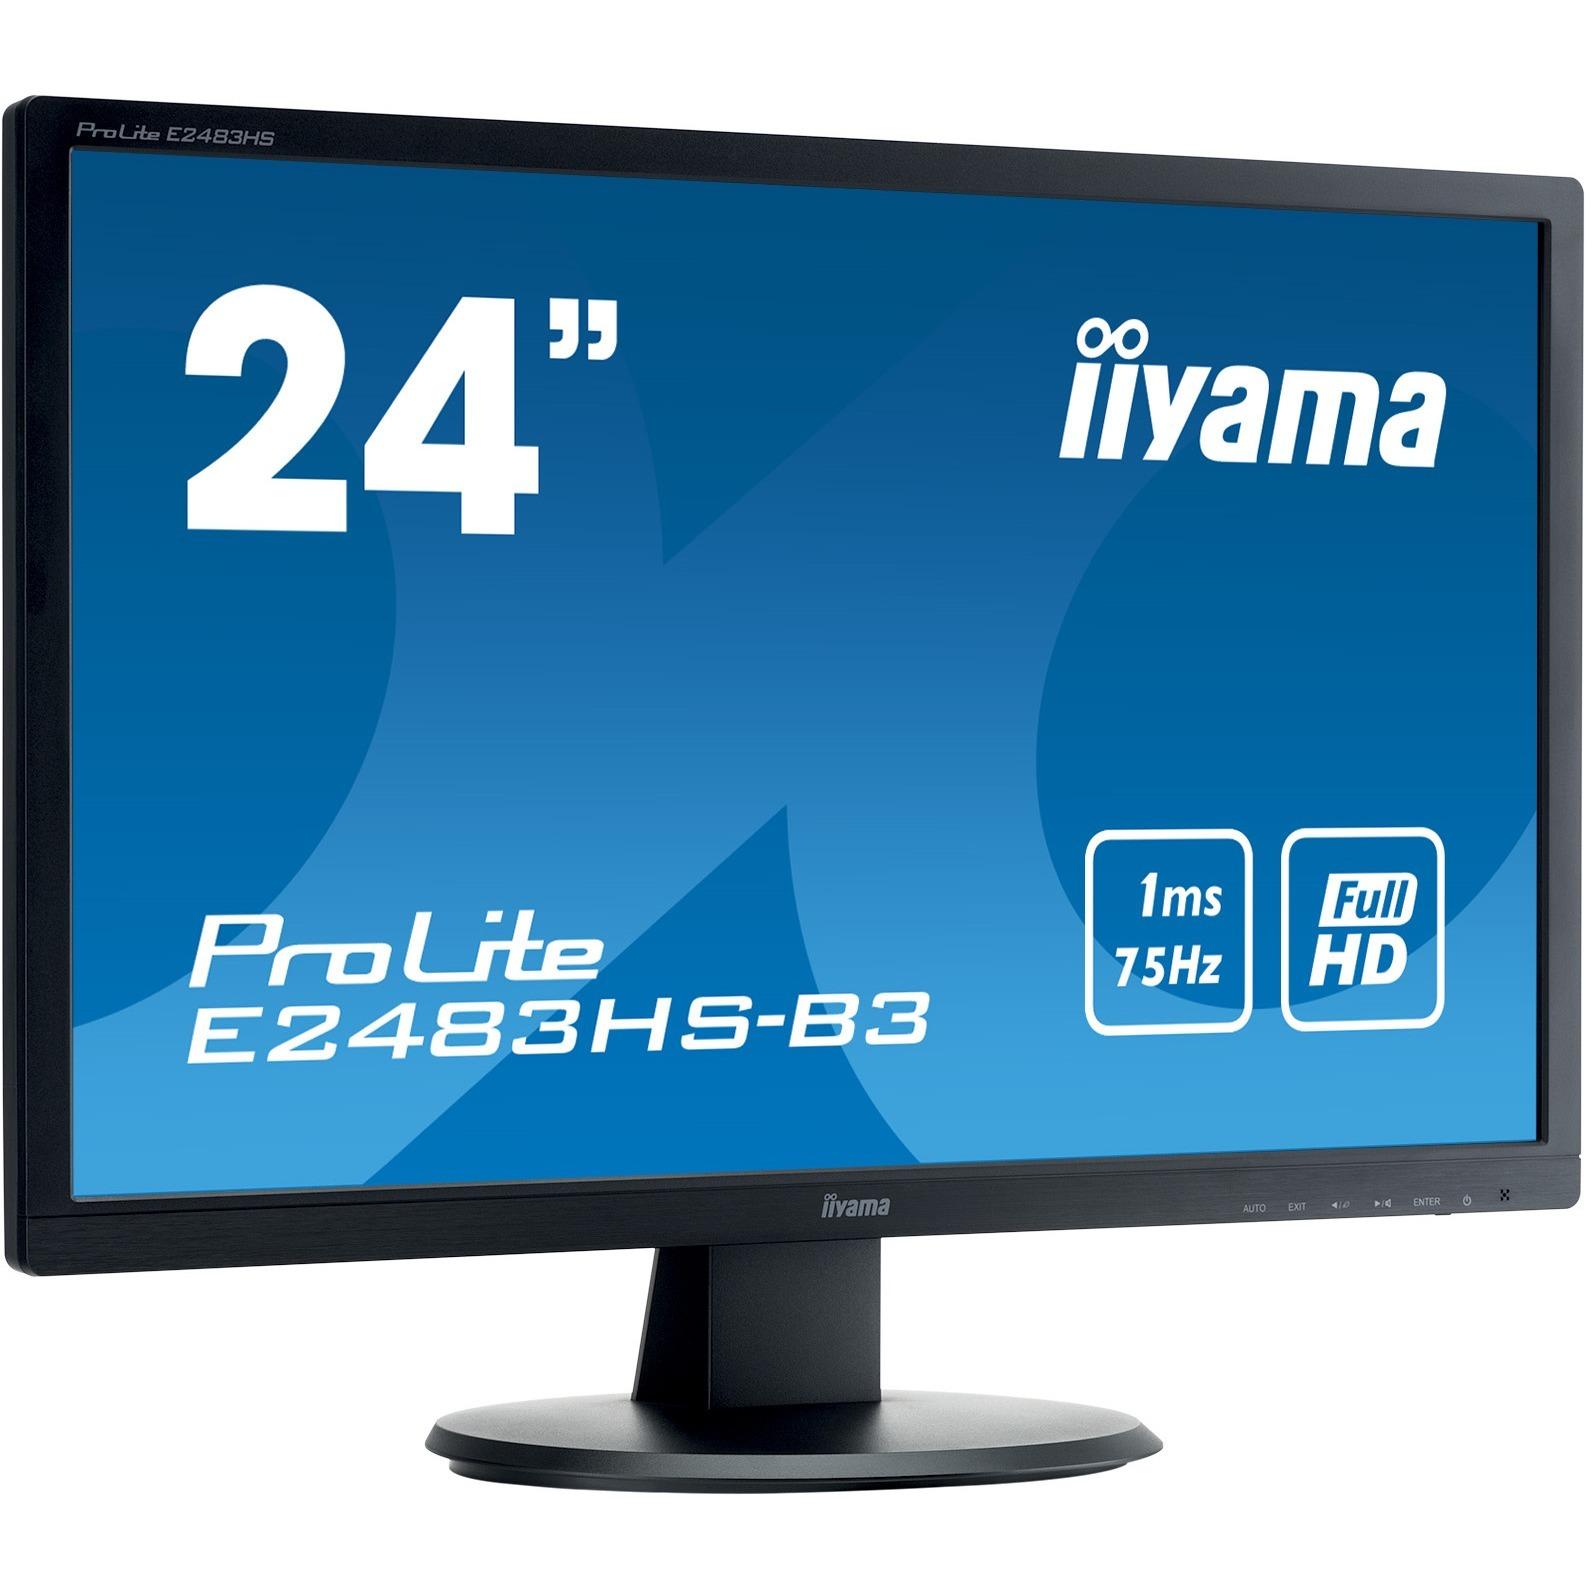 Iiyama Prolite E2483hs B3 24inch Wled Lcd Monitor 16 9 1 Ms